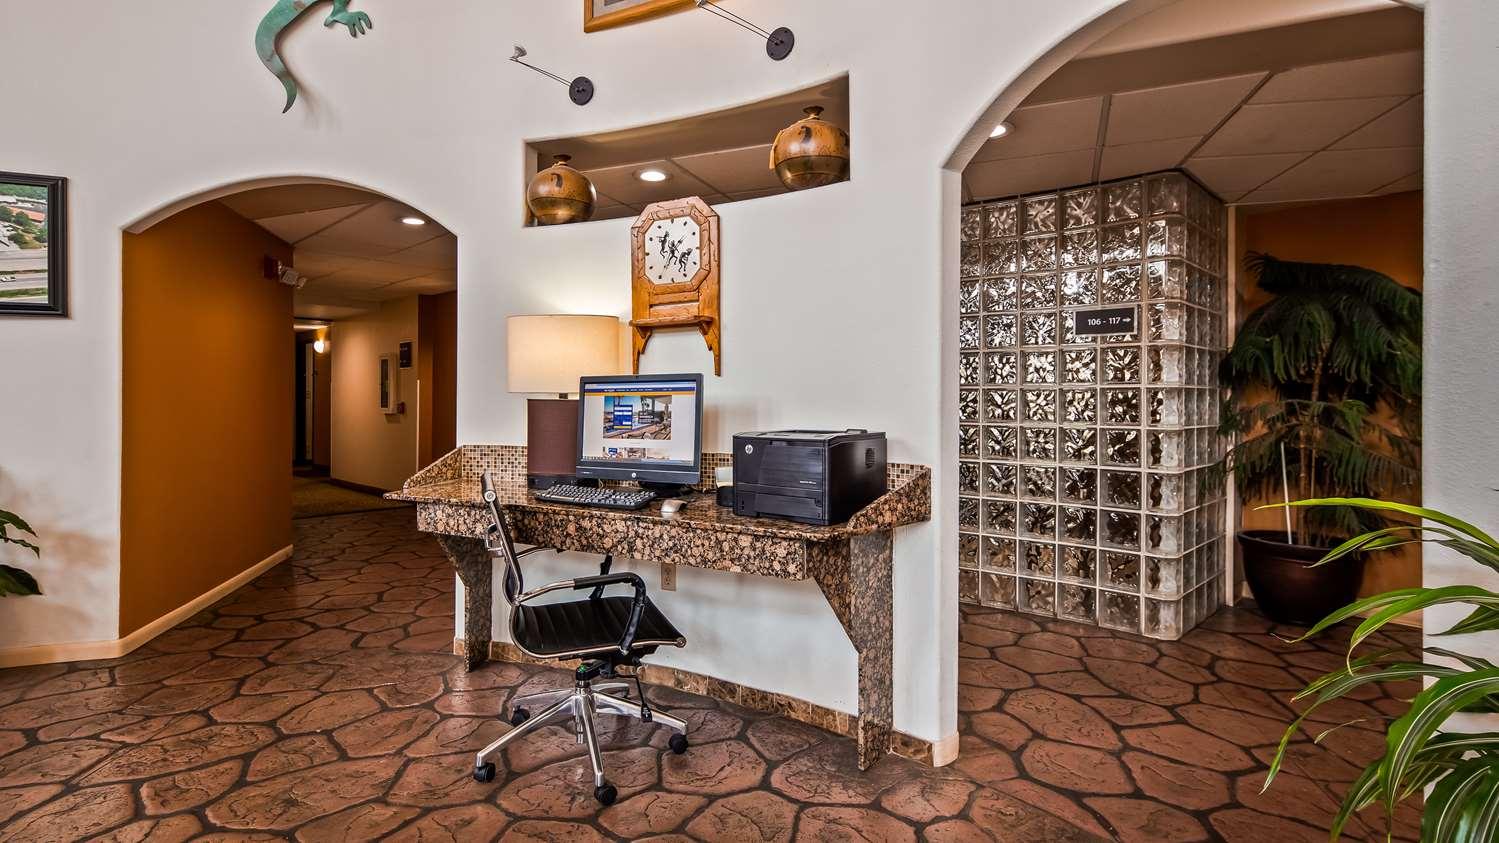 proam - Best Western Kiva Inn Fort Collins